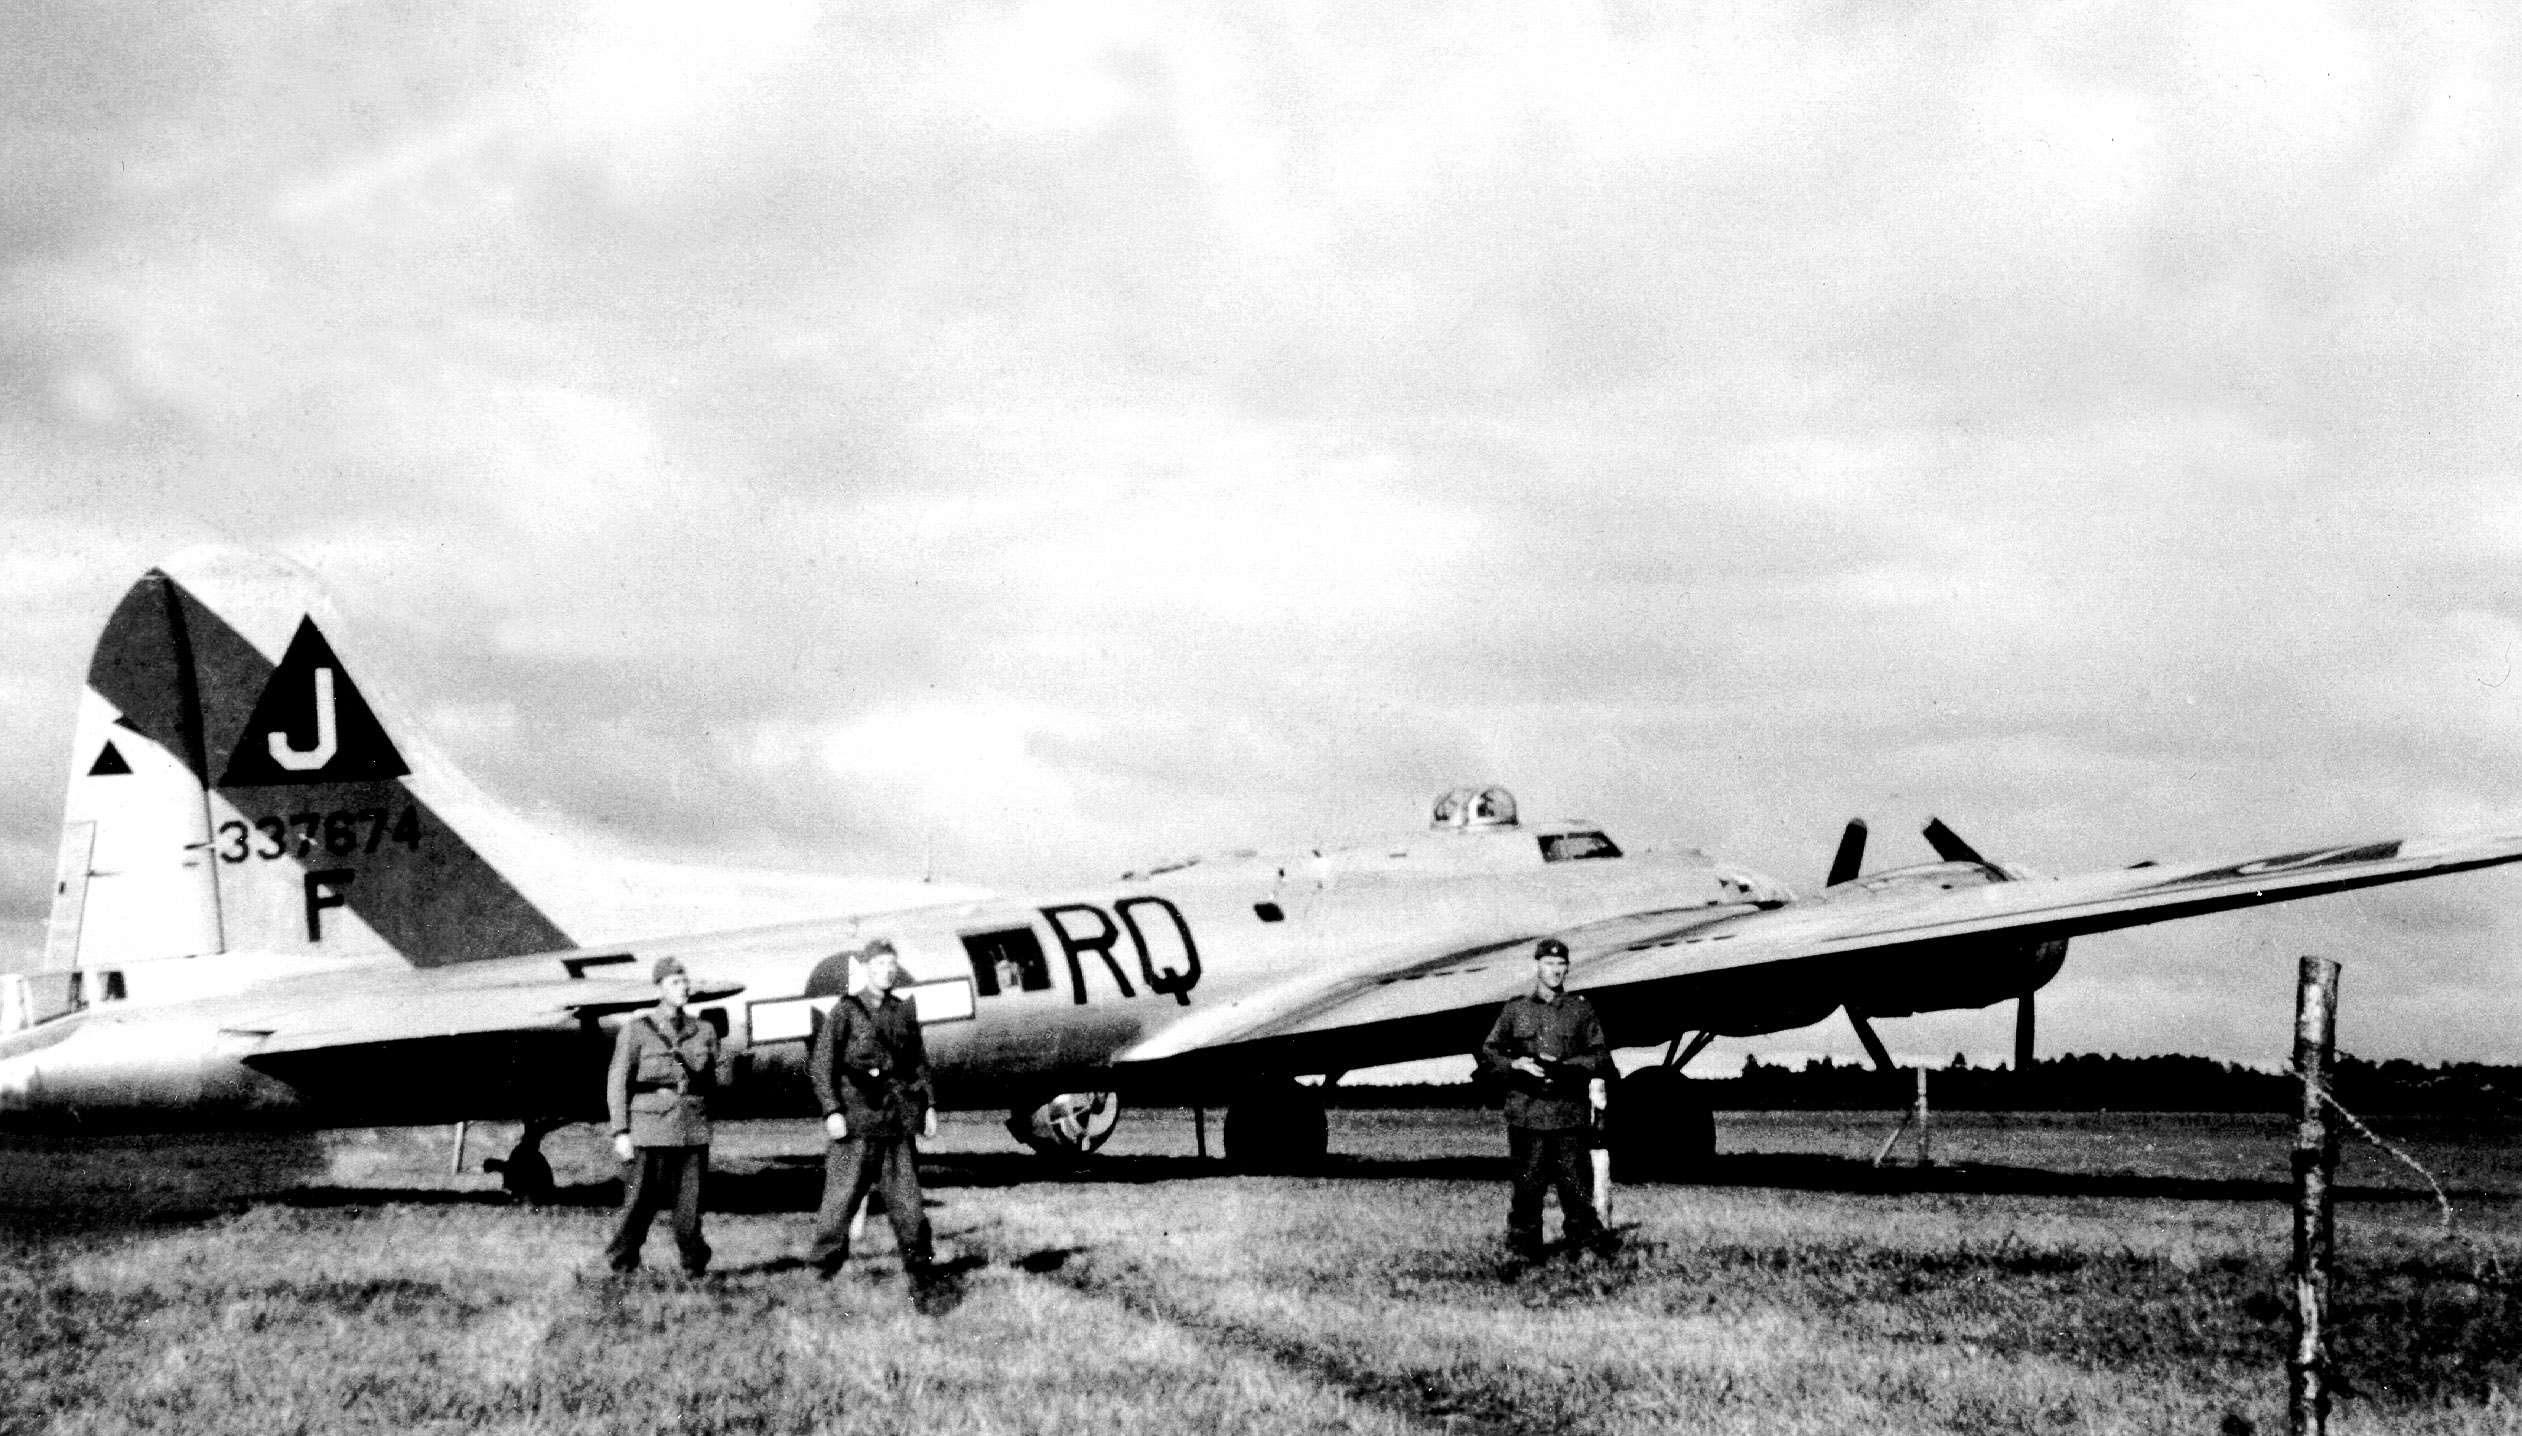 B-17 #43-37674